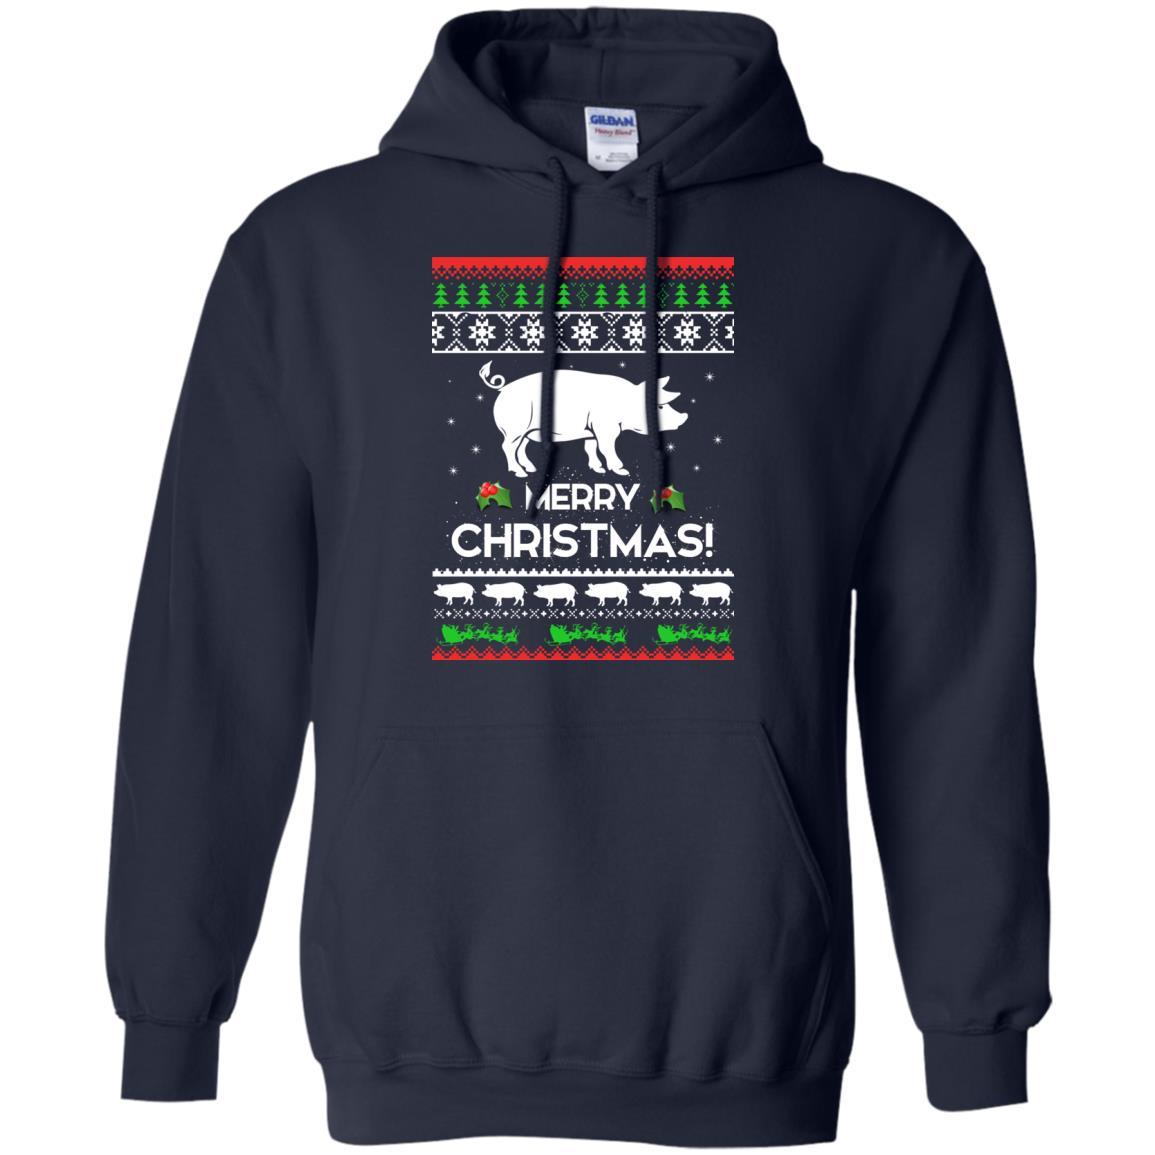 image 3876 - Merry Pigmas Christmas Pig Ugly Sweater, Shirt